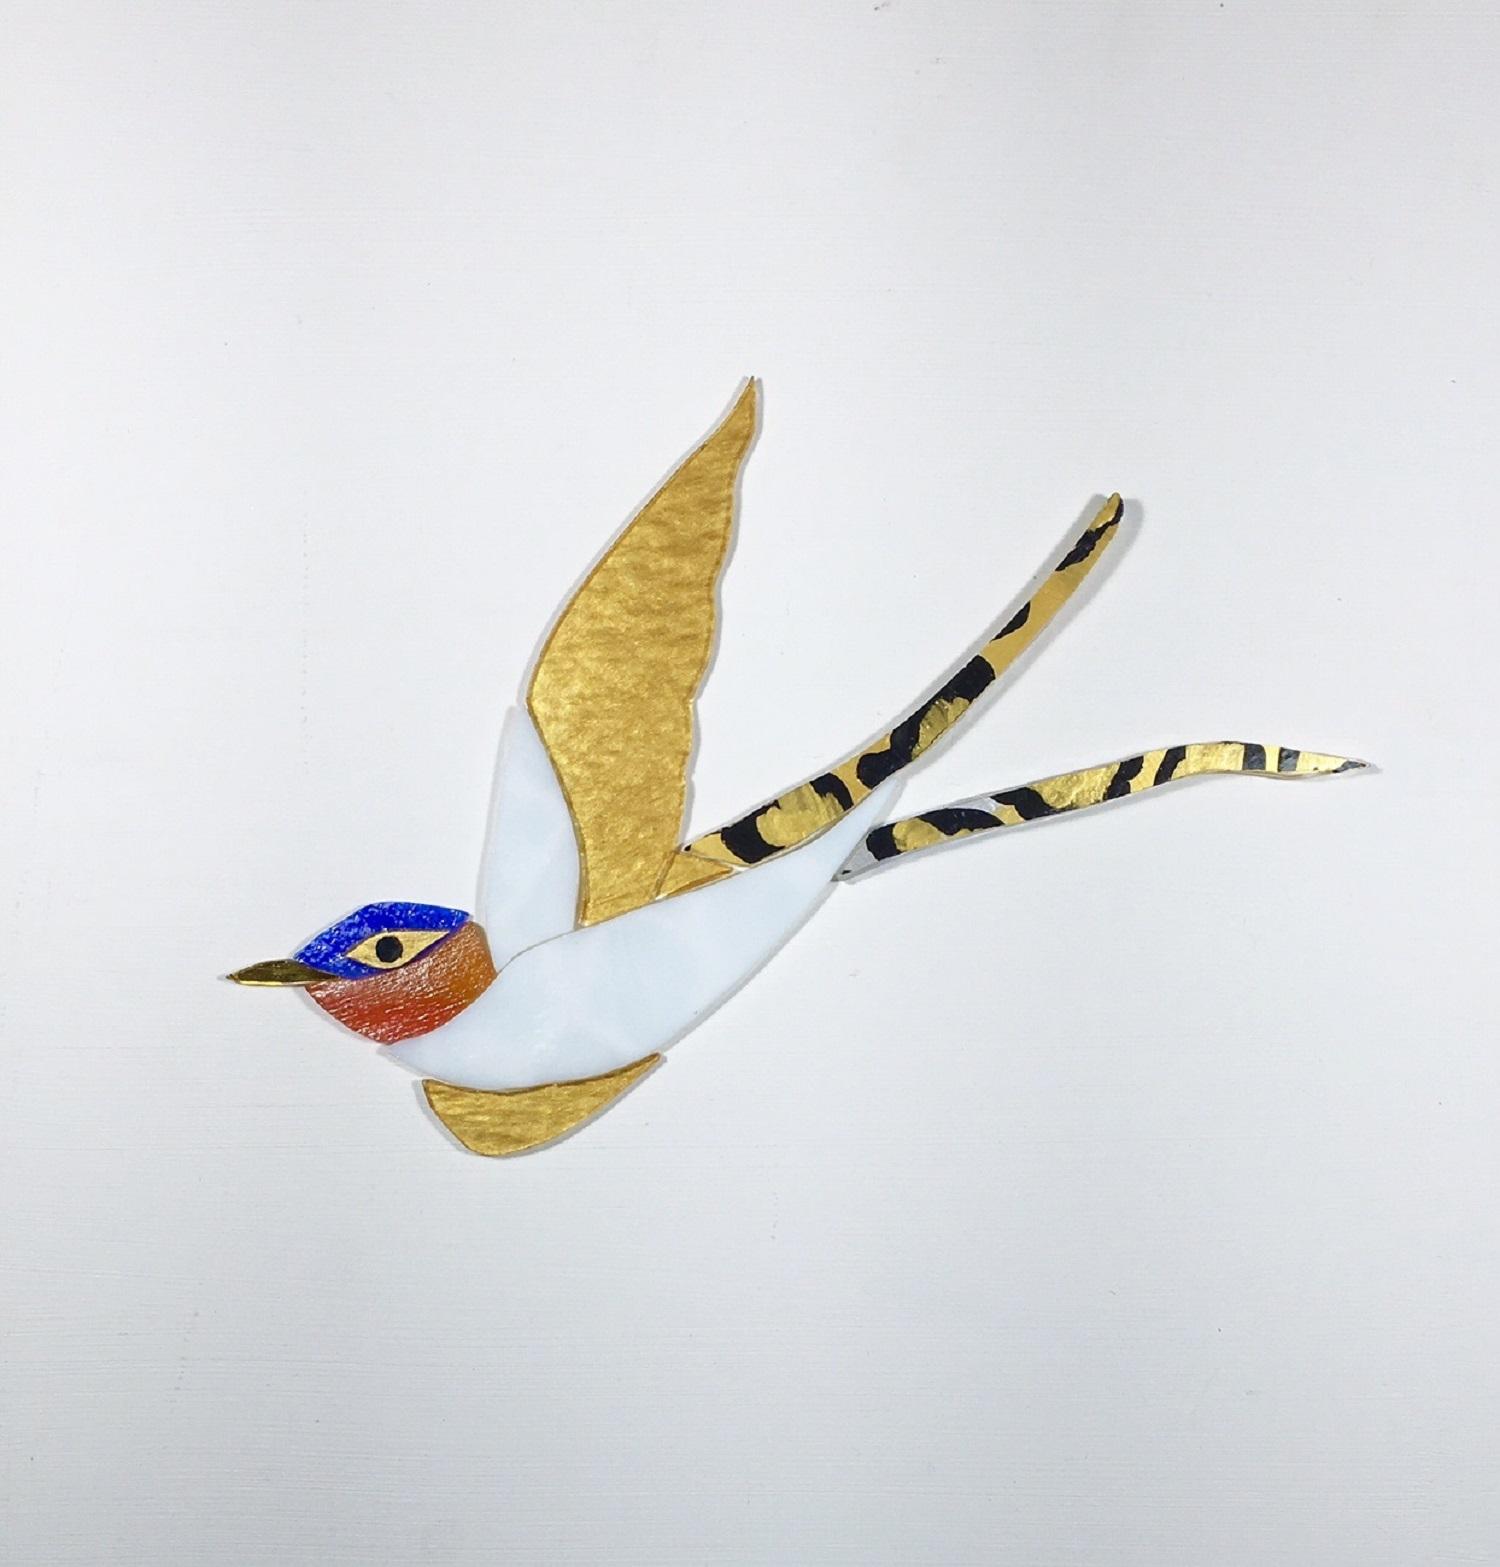 Wing-glass-street-art-leopardtail-bird-2-nyc.jpg